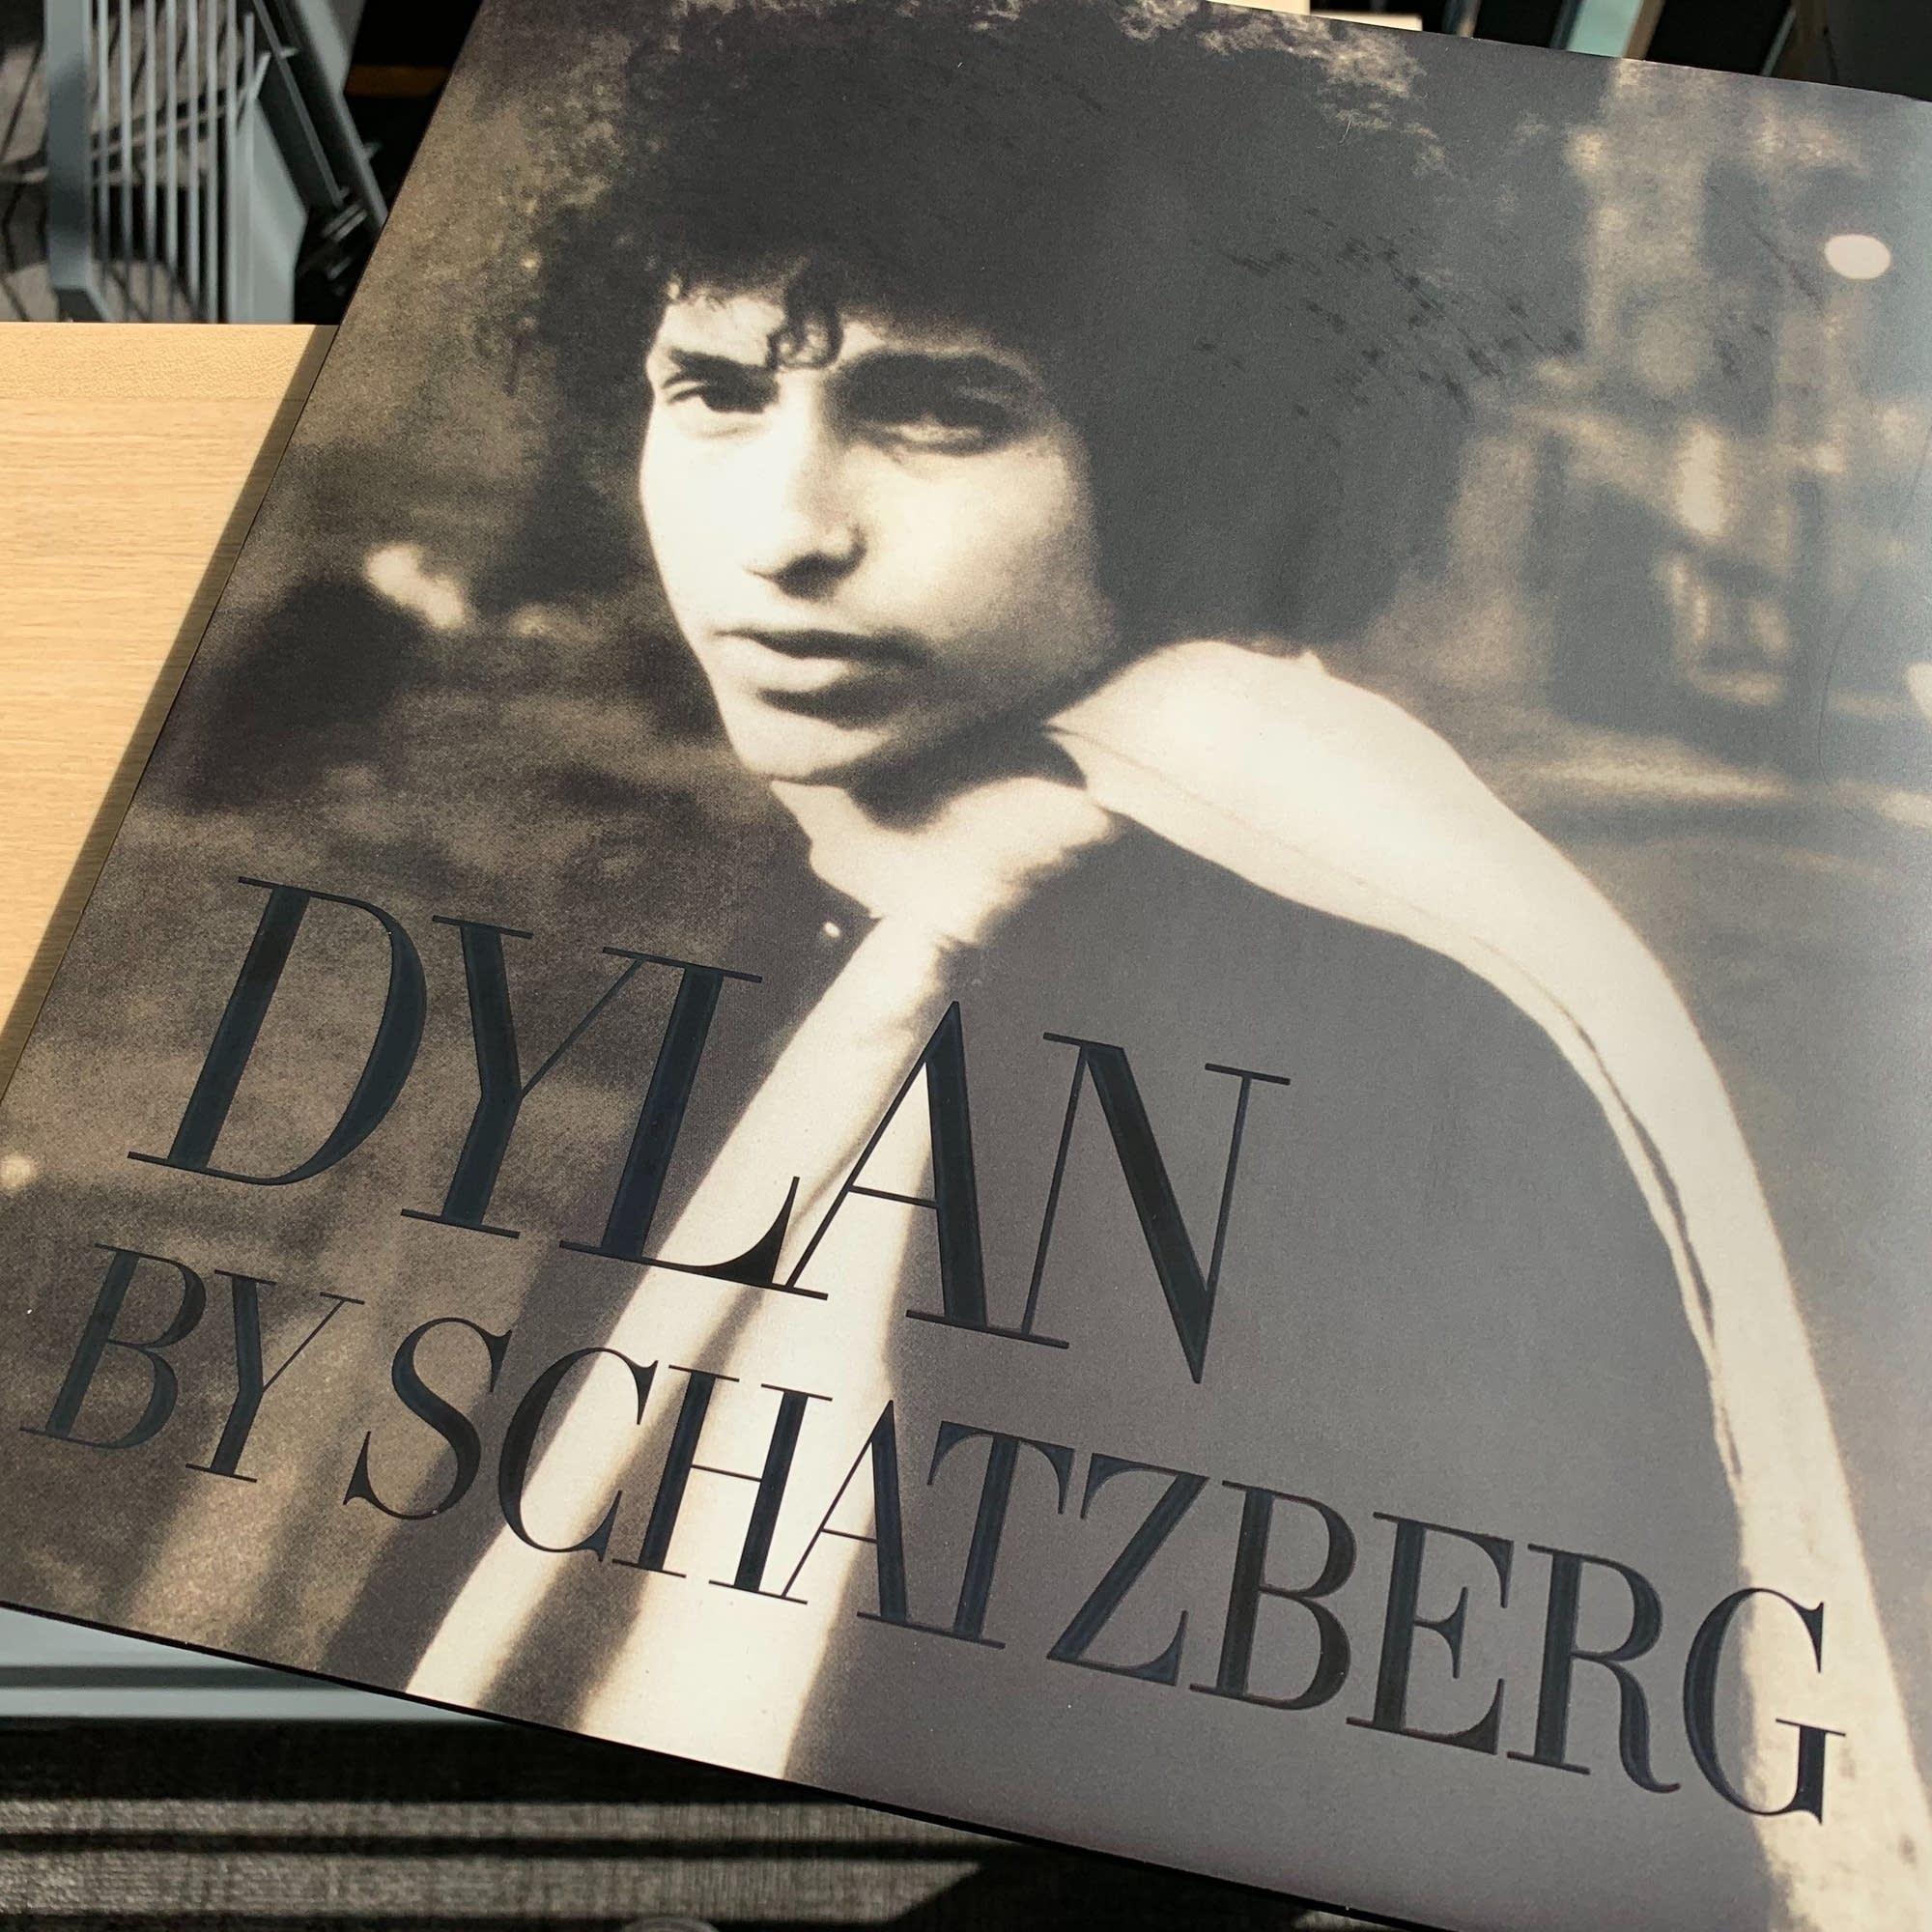 'Dylan by Schatzberg' photo book.